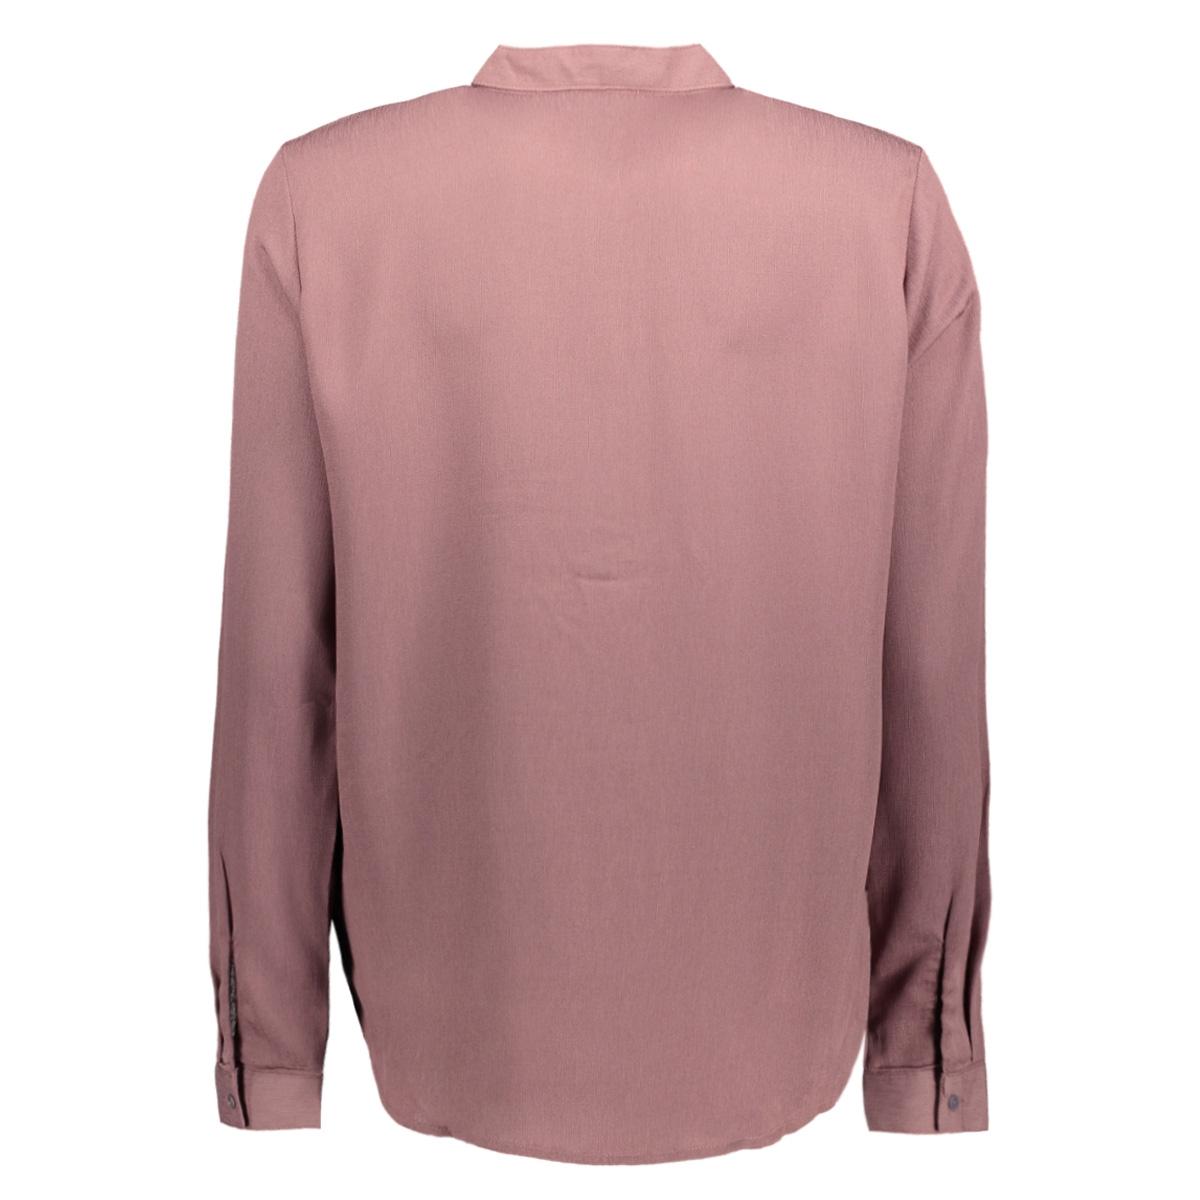 jdytribby l/s shirt wvn 15142447 jacqueline de yong blouse rose taupe